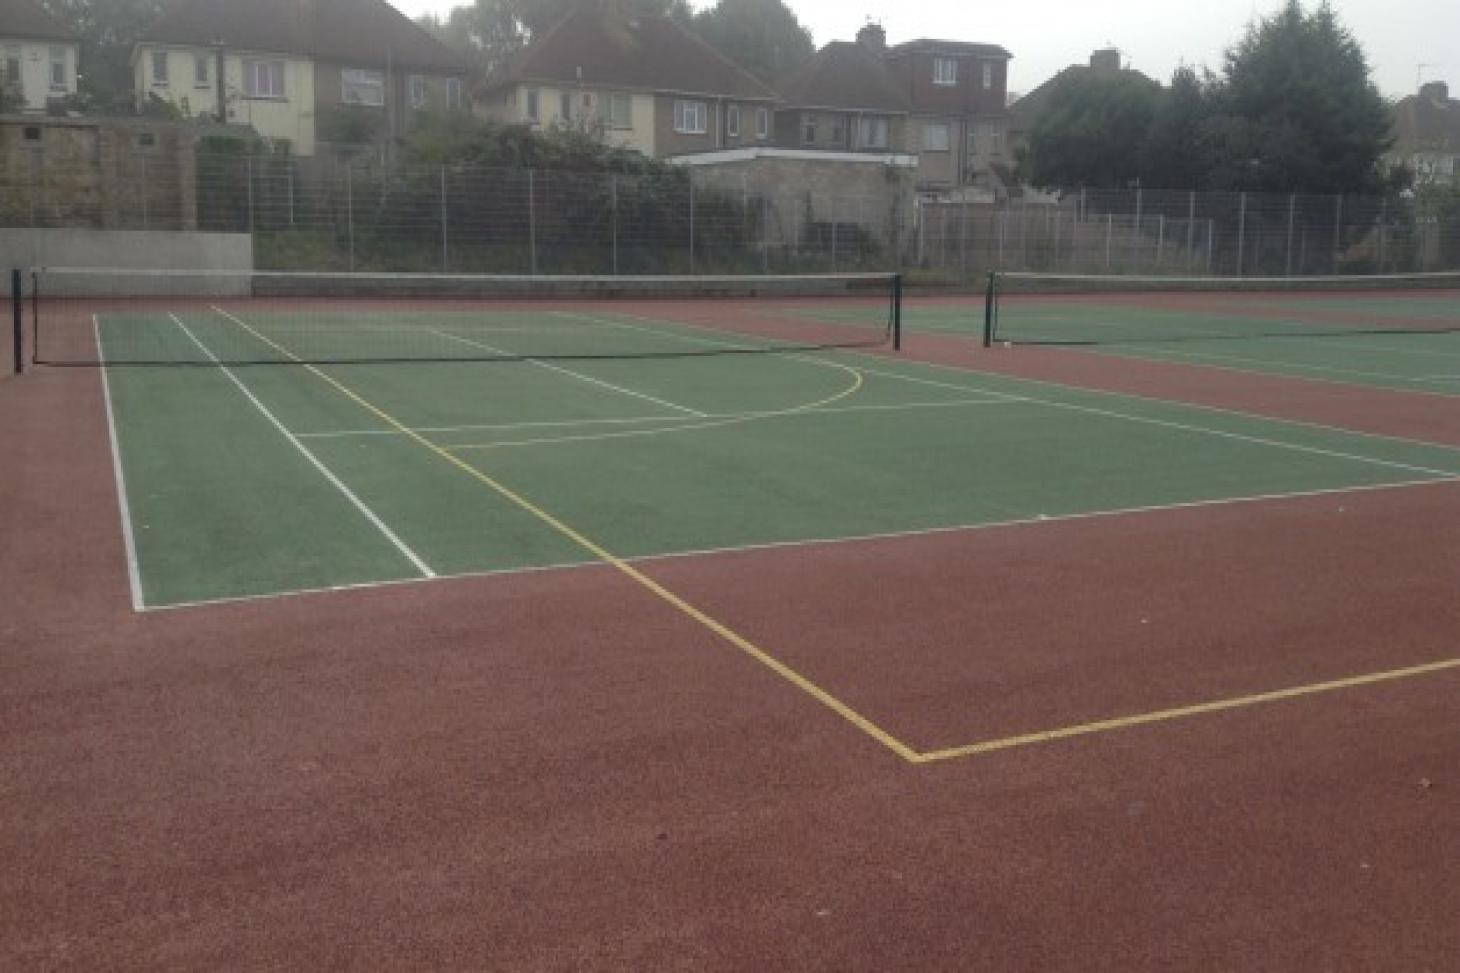 Northfleet Technology College Outdoor | Hard (macadam) basketball court